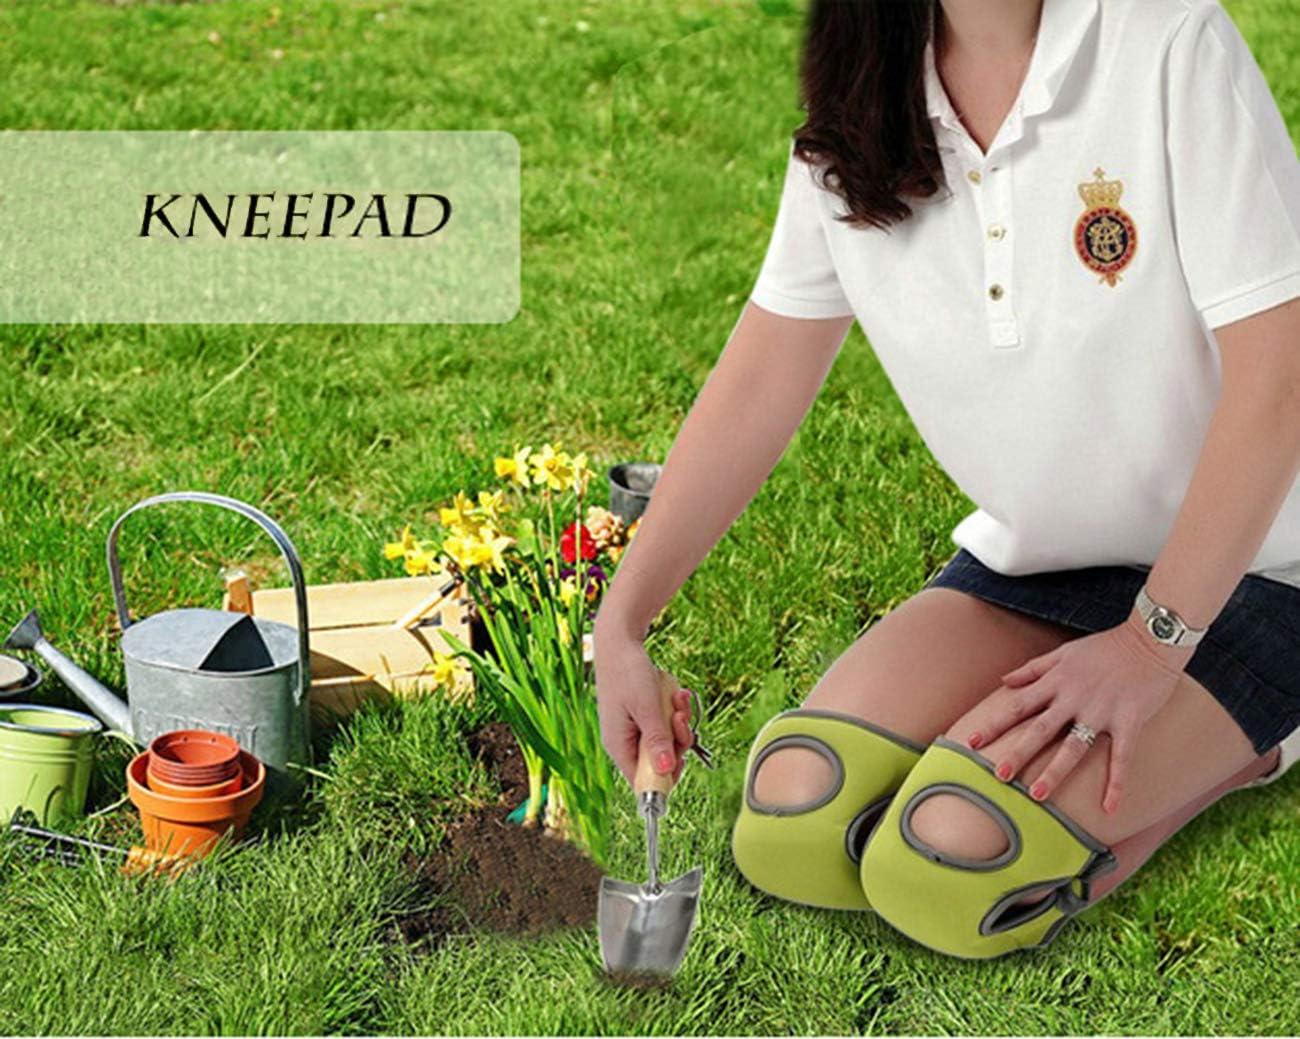 ChirRay Thicken Neoprene Knee Pads Comfort Knee Protection Caps for Scrubbing Floors Gardening Yoga Construction Outdoor Women Children